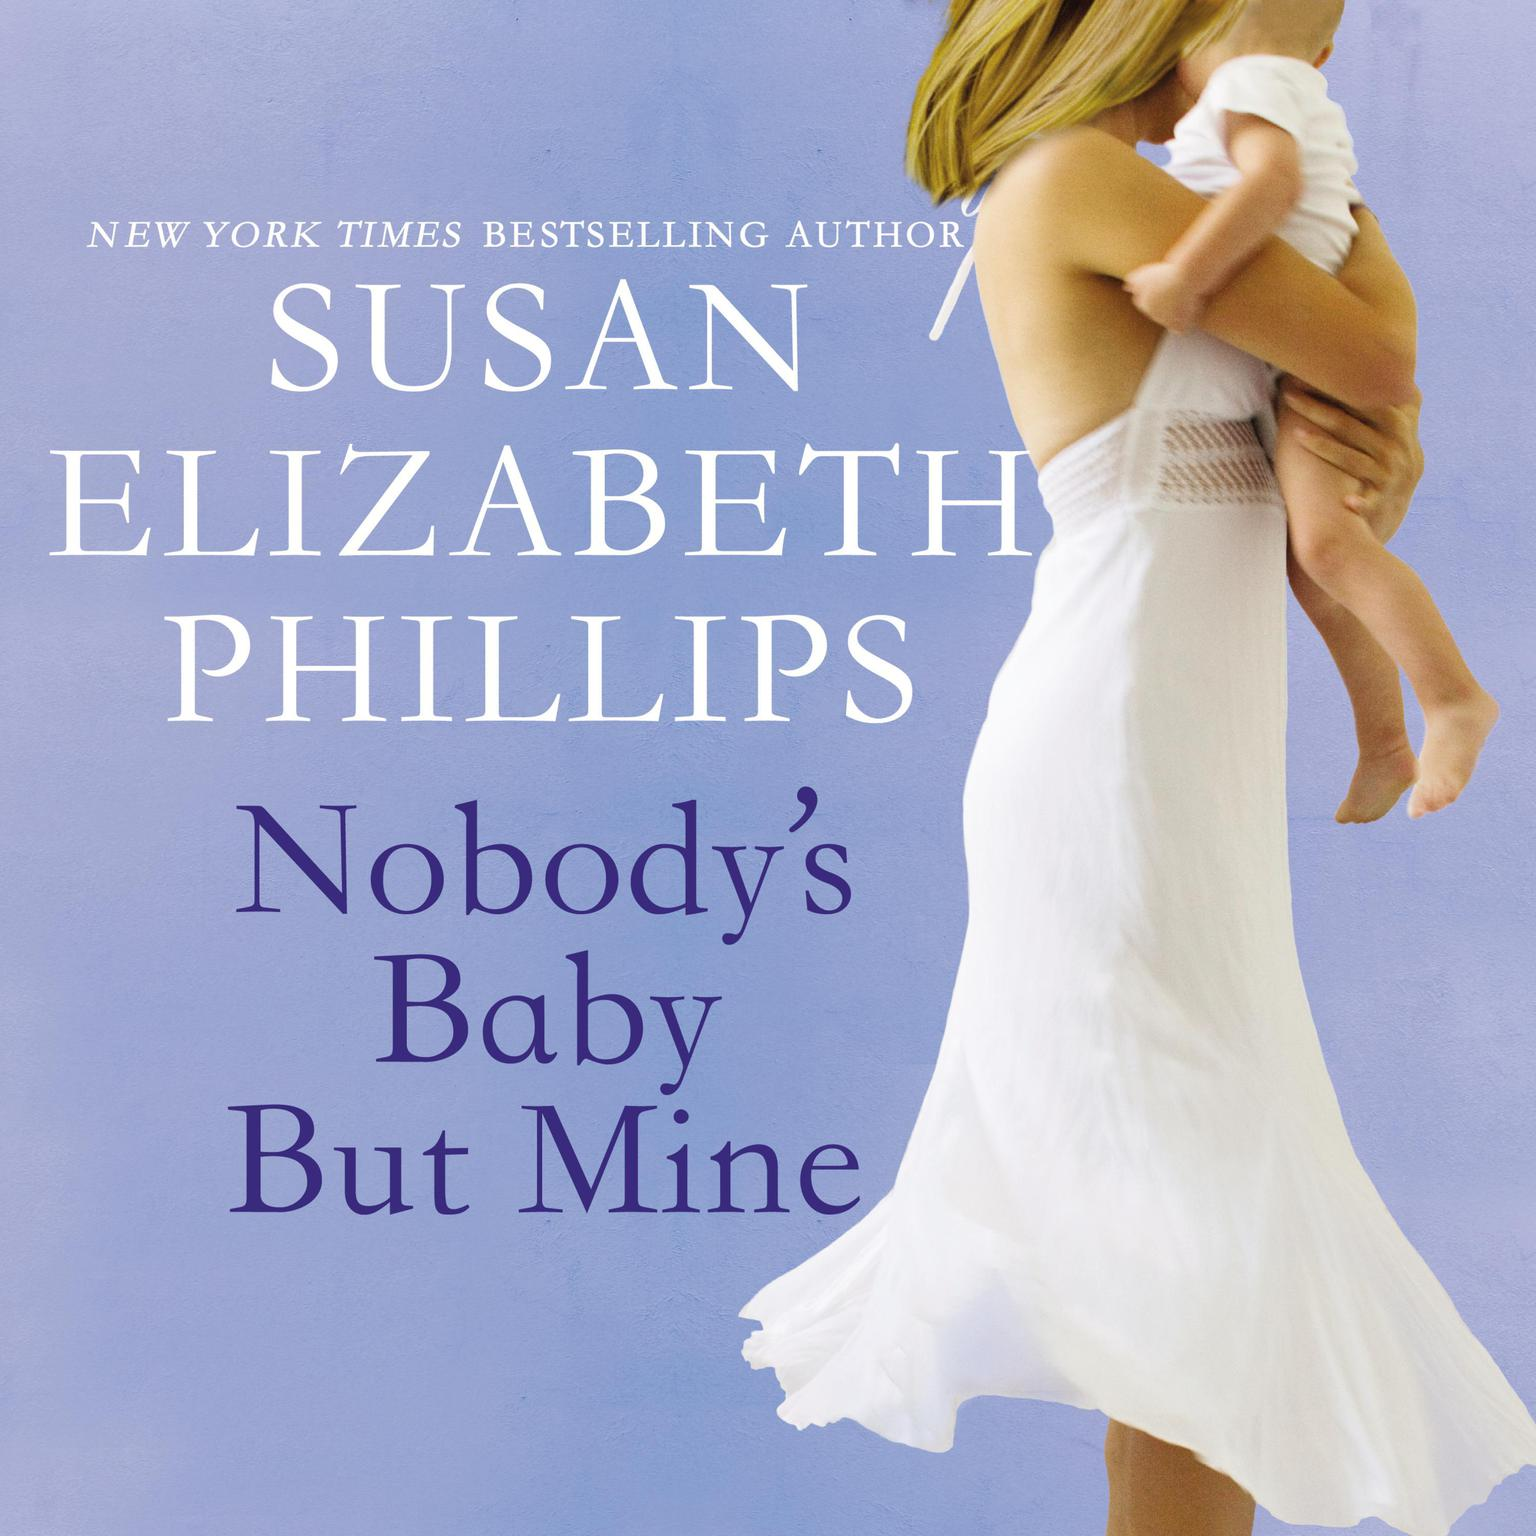 Nobodys Baby But Mine Audiobook, by Susan Elizabeth Phillips